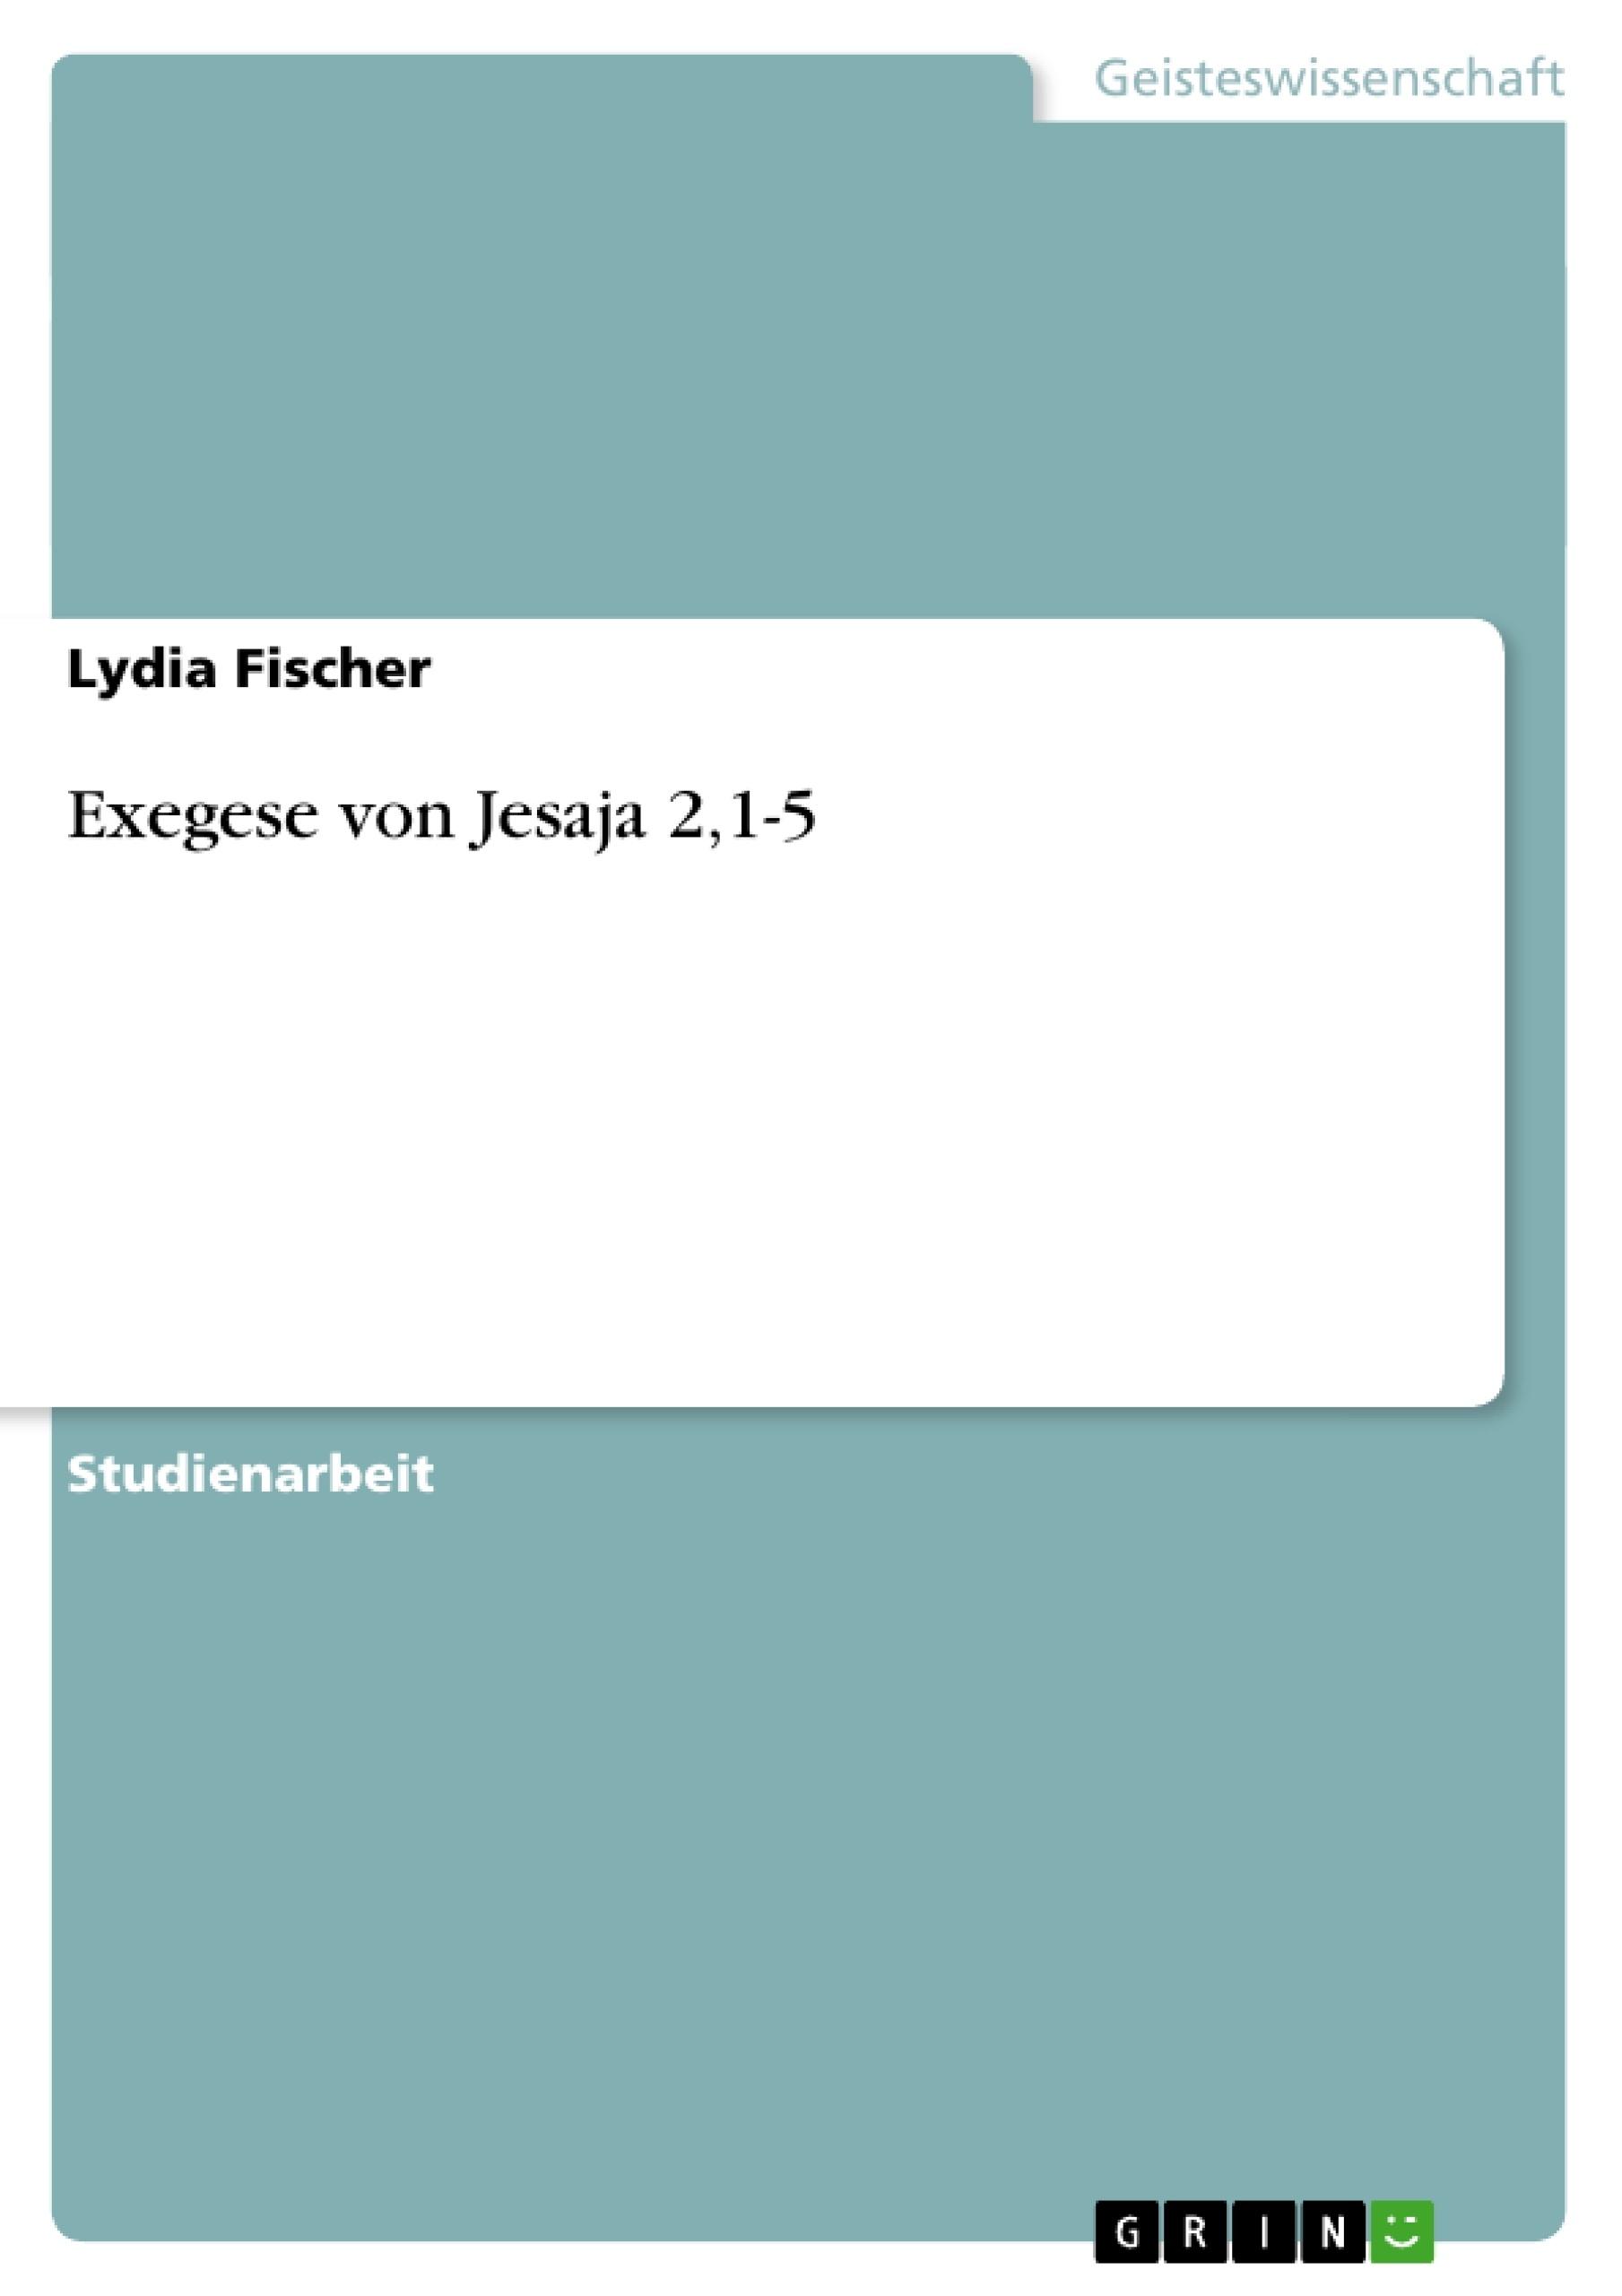 Titel: Exegese von Jesaja 2,1-5